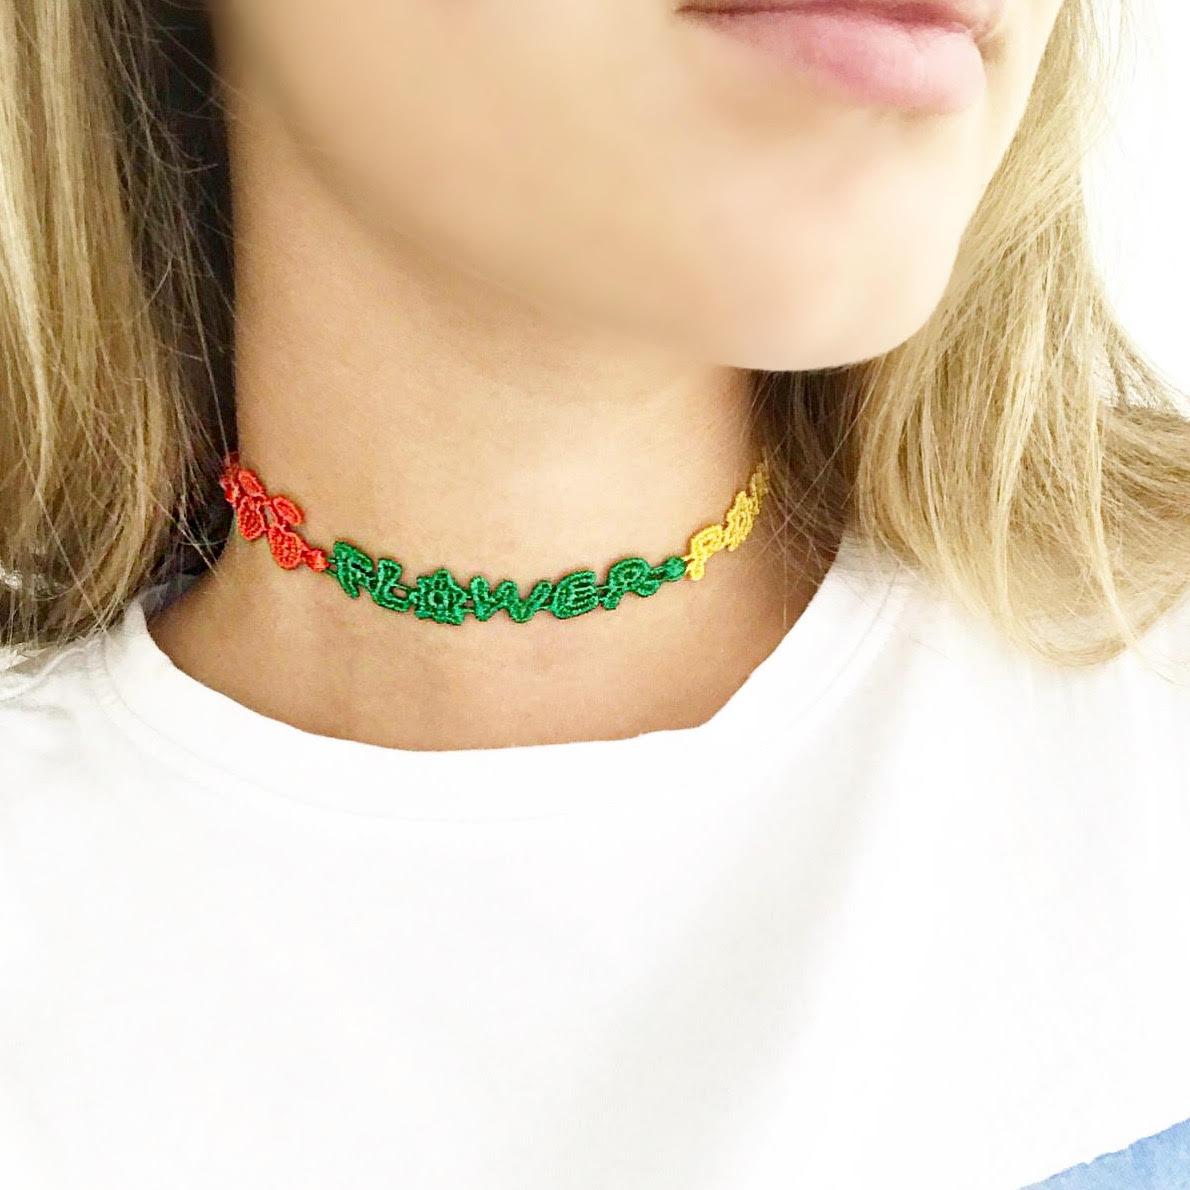 Čelenka / náhrdeľník / náramok CRUCIANI Flower power